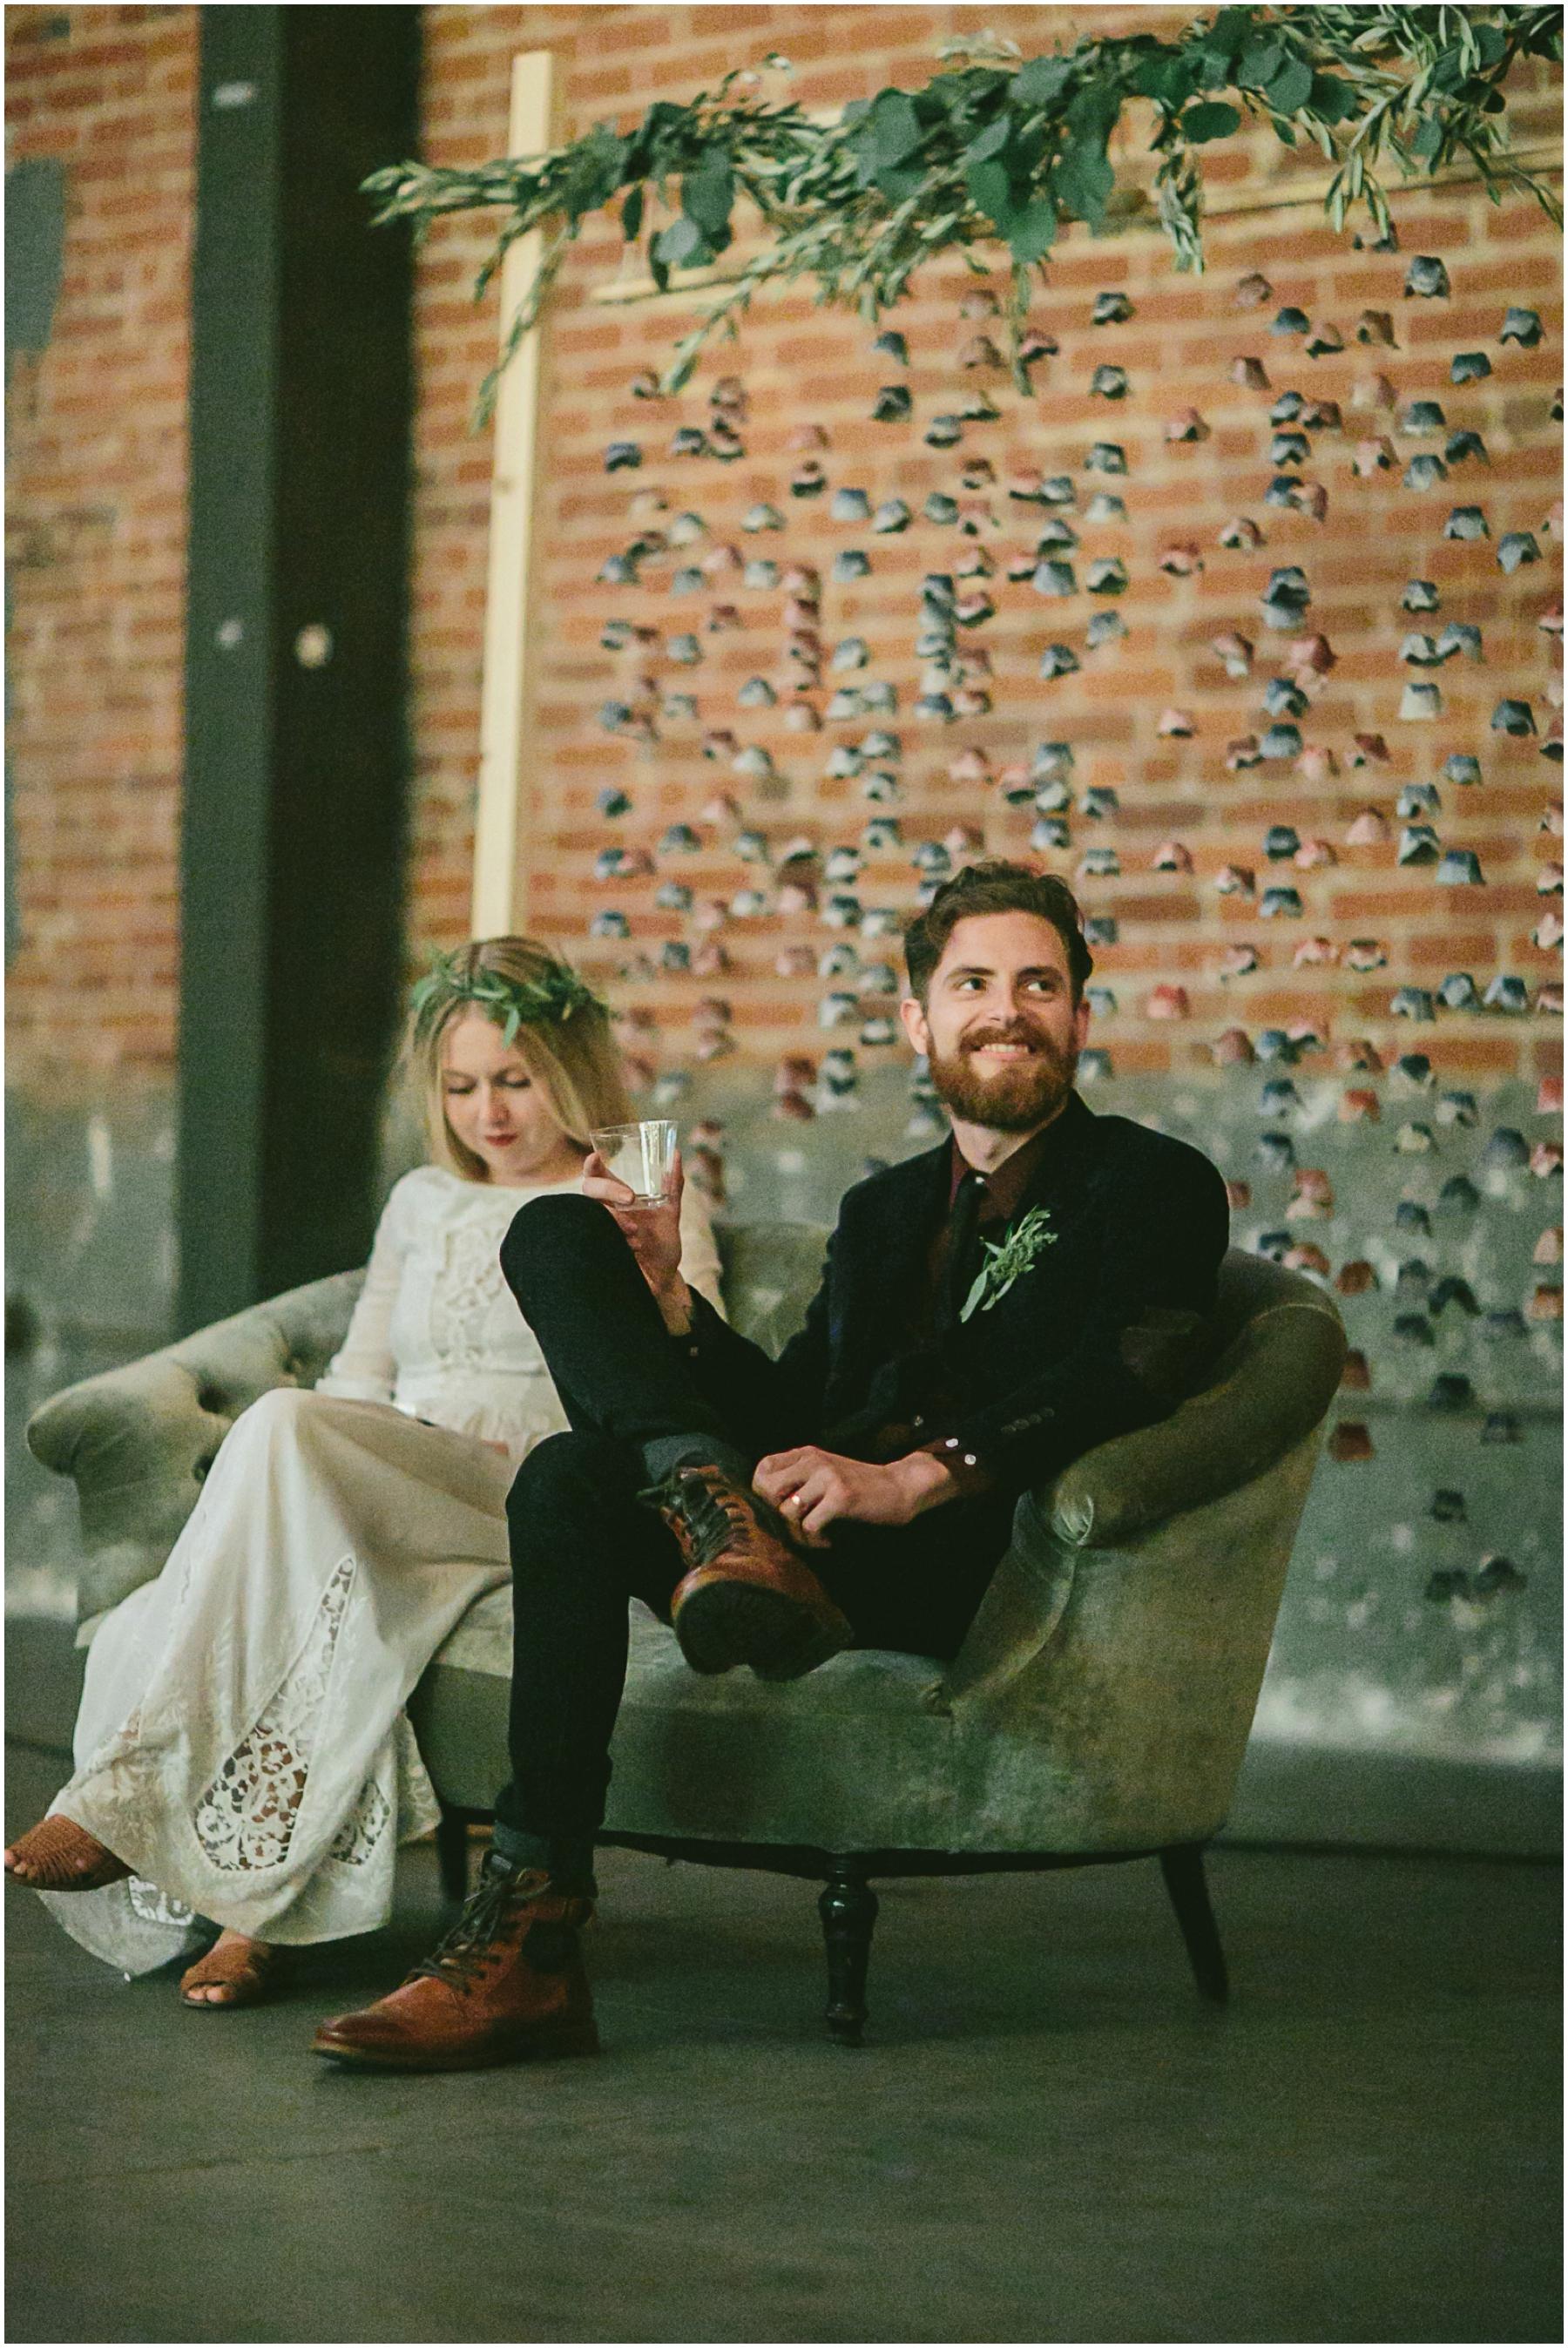 Natalie+Corey-WEDDING_KELLYBOITANO_0120